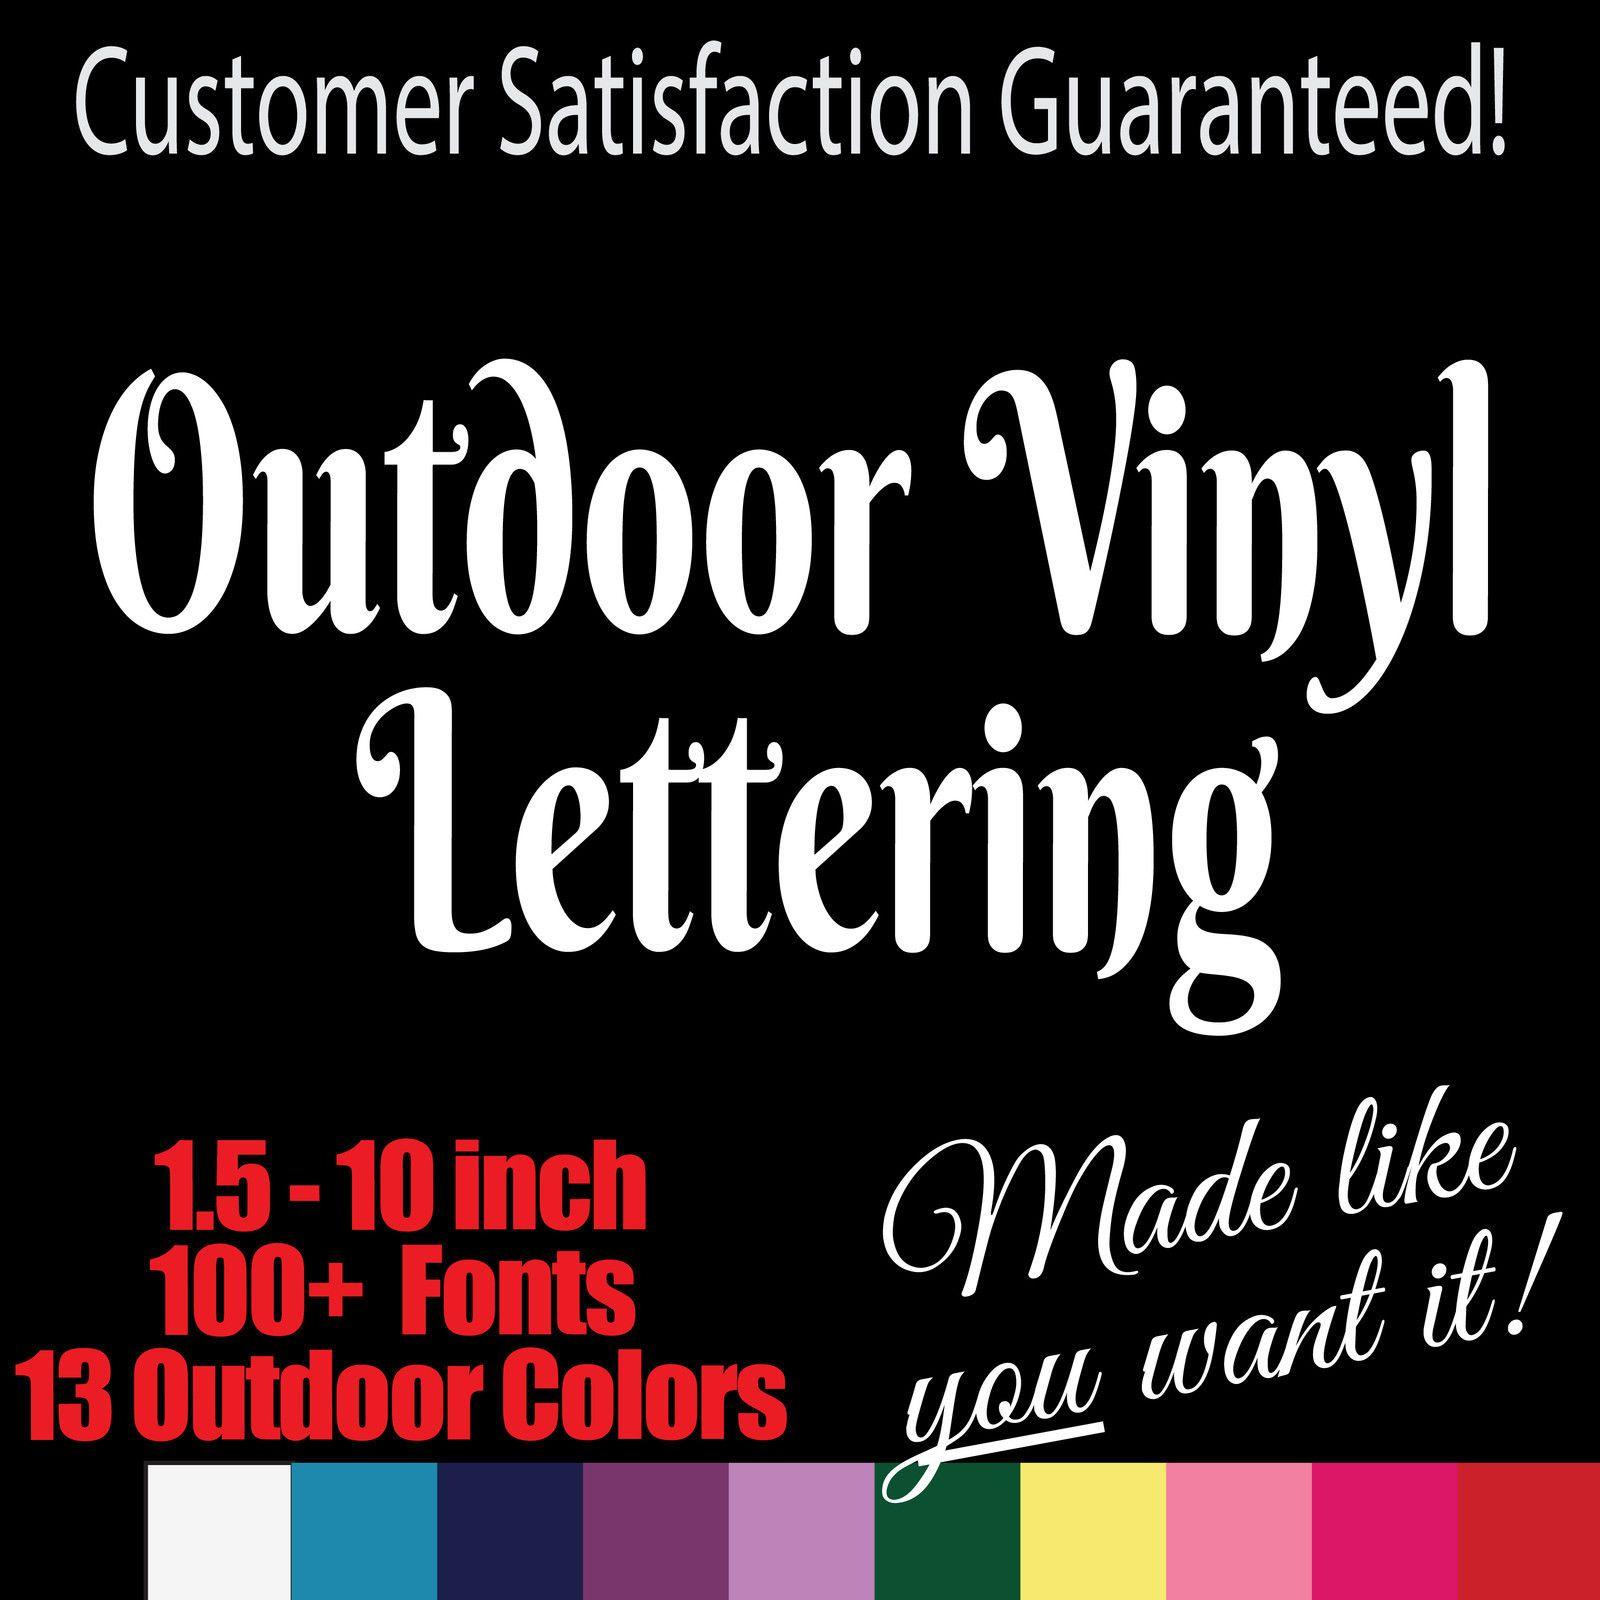 74756dc4d1 Custom Outdoor Vinyl Lettering. Window Truck Jeep Decal Sticker ...